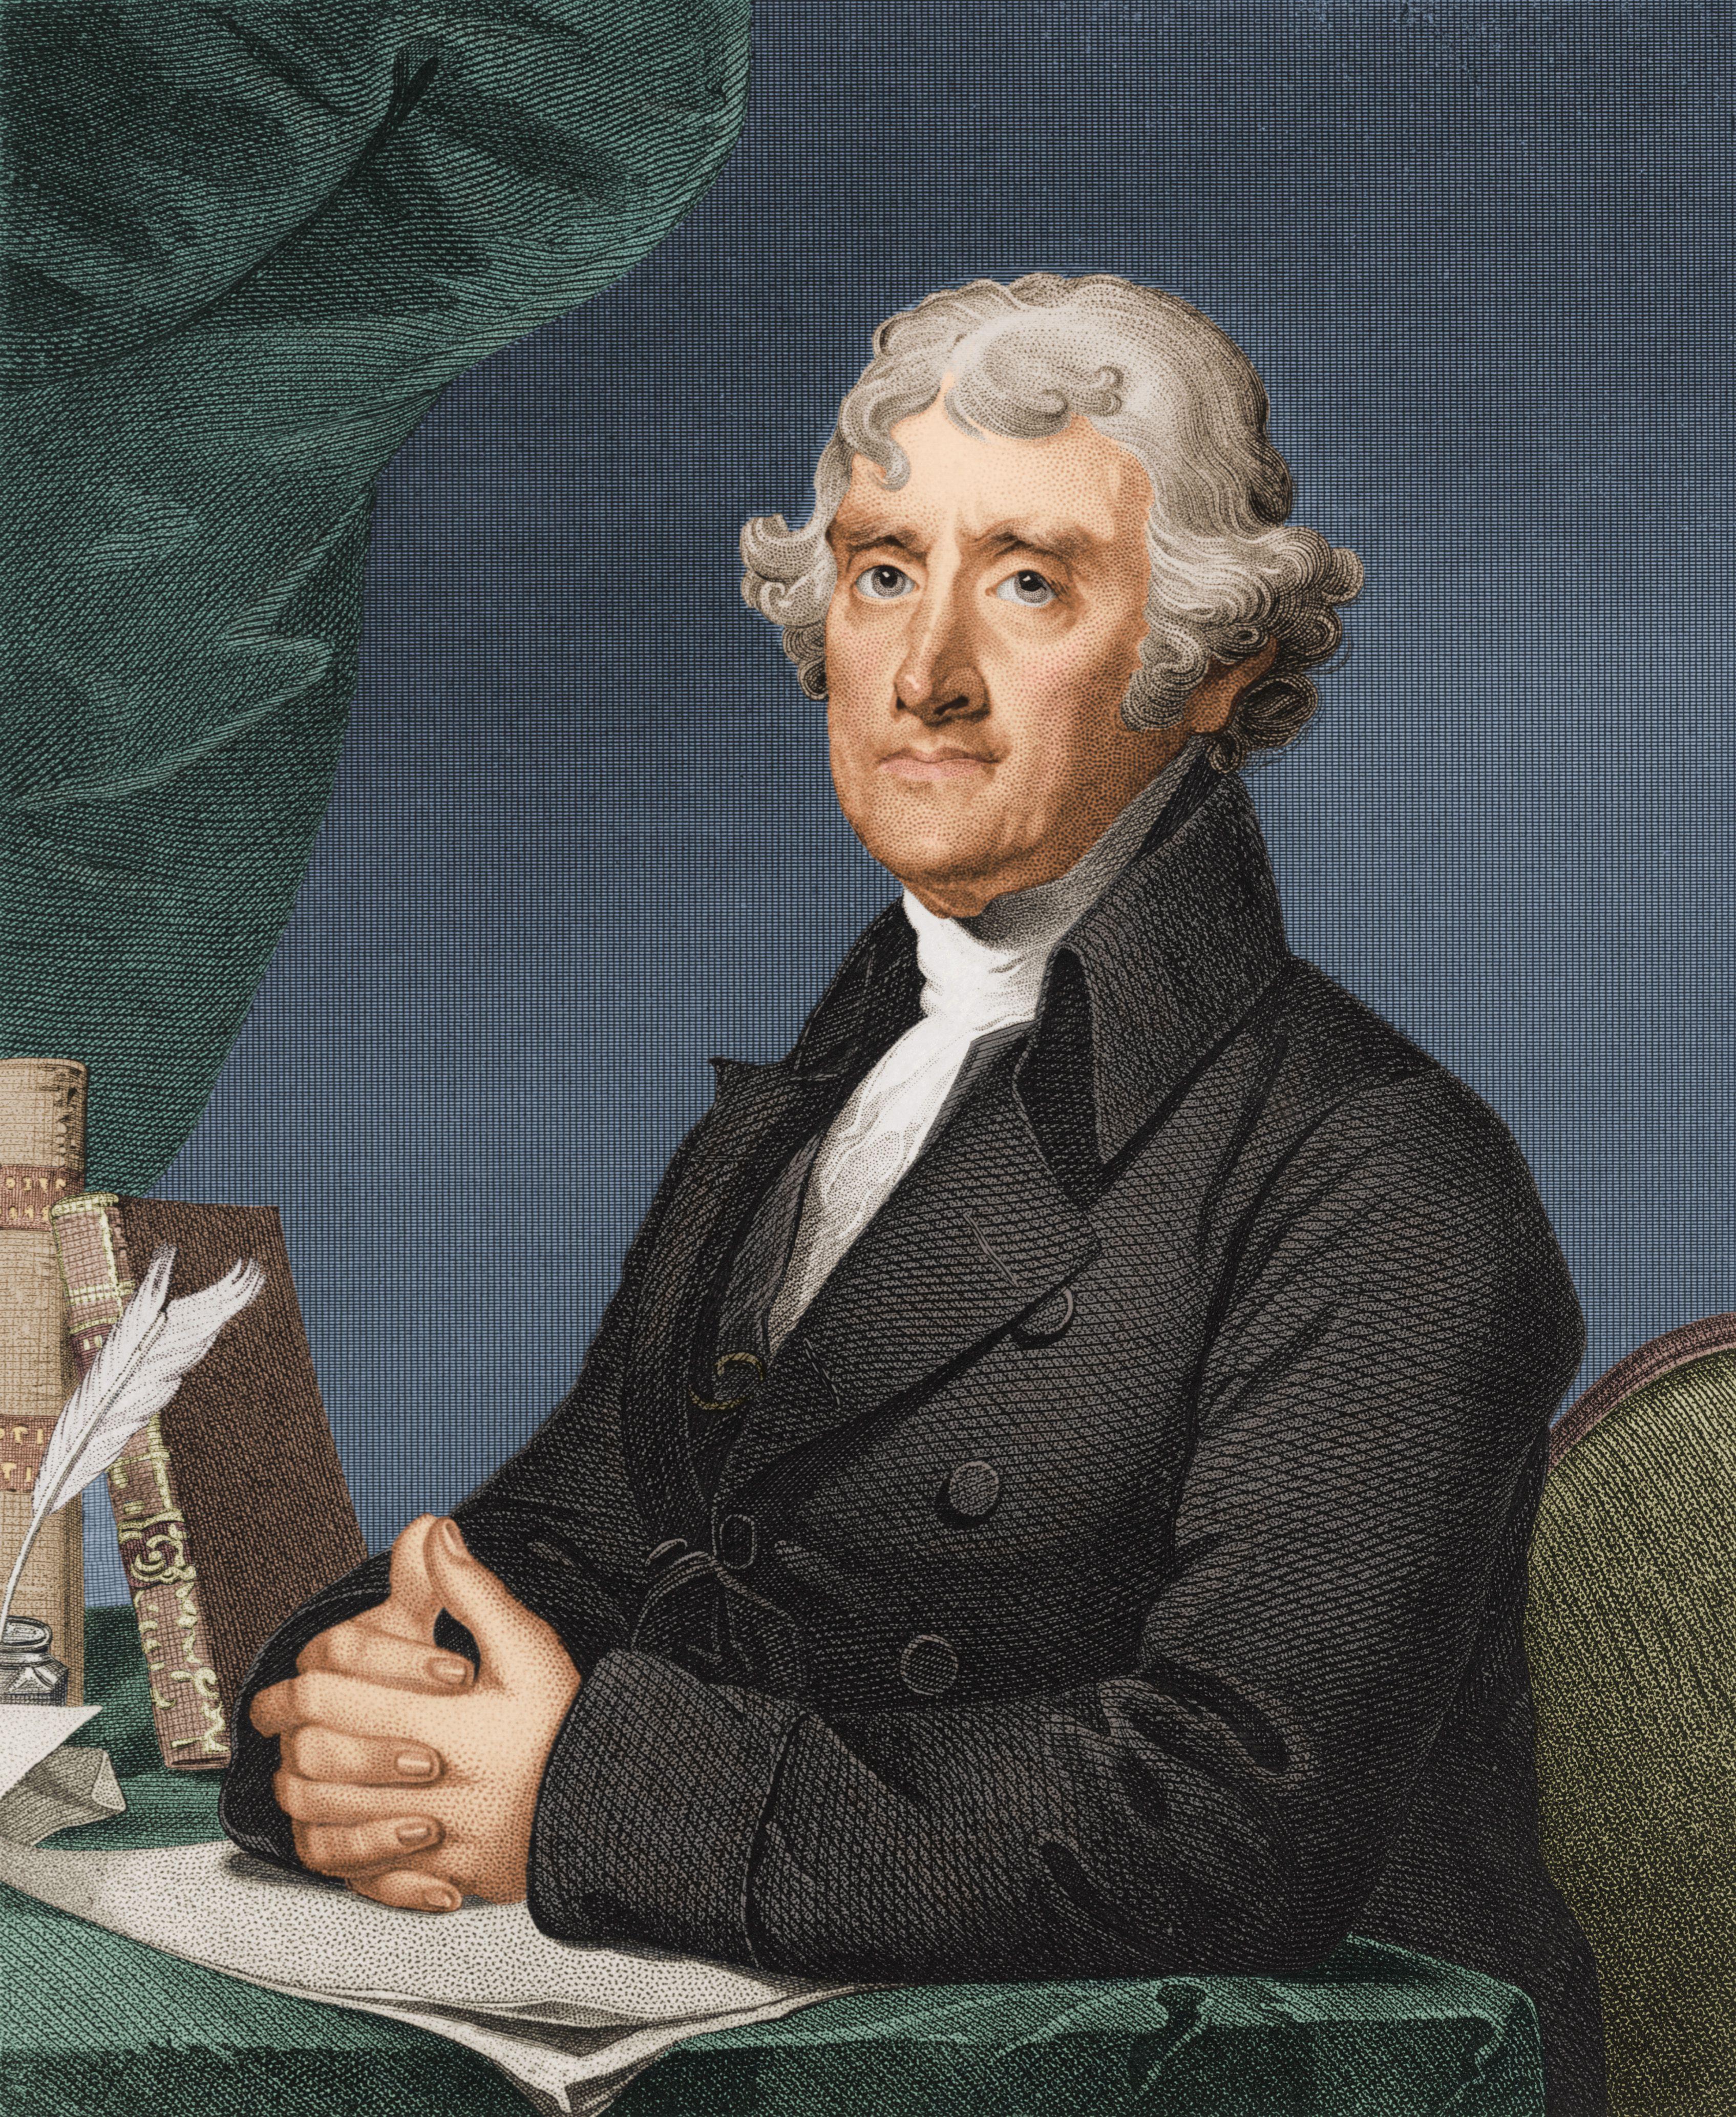 president thomas jefferson images - HD3390×4133